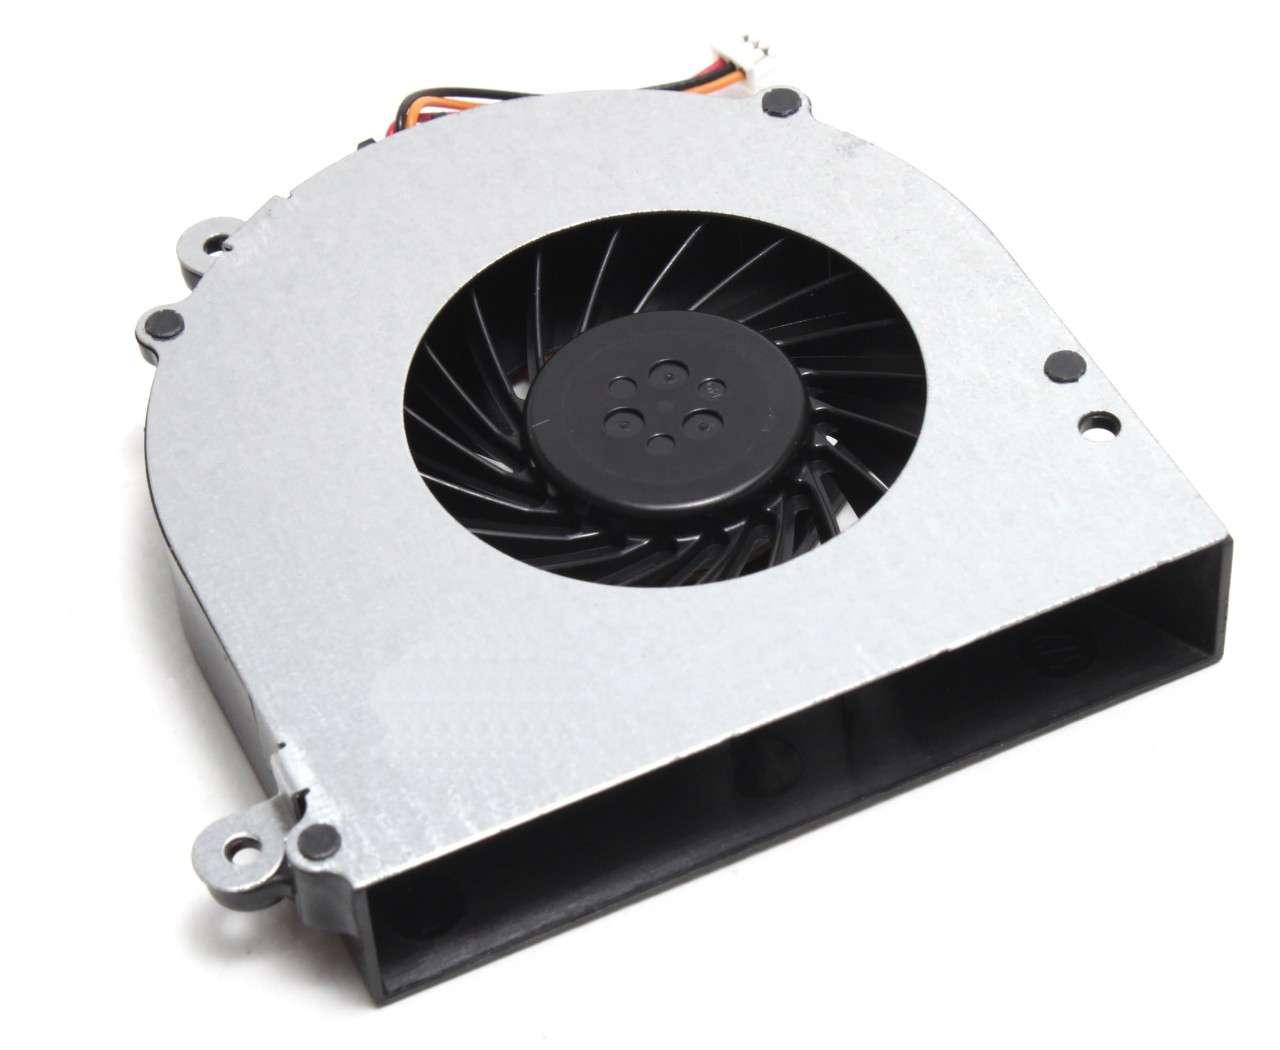 Cooler laptop Toshiba Satellite A500D compatibil doar pentru varianta echipata cu procesor Intel i-Core imagine powerlaptop.ro 2021